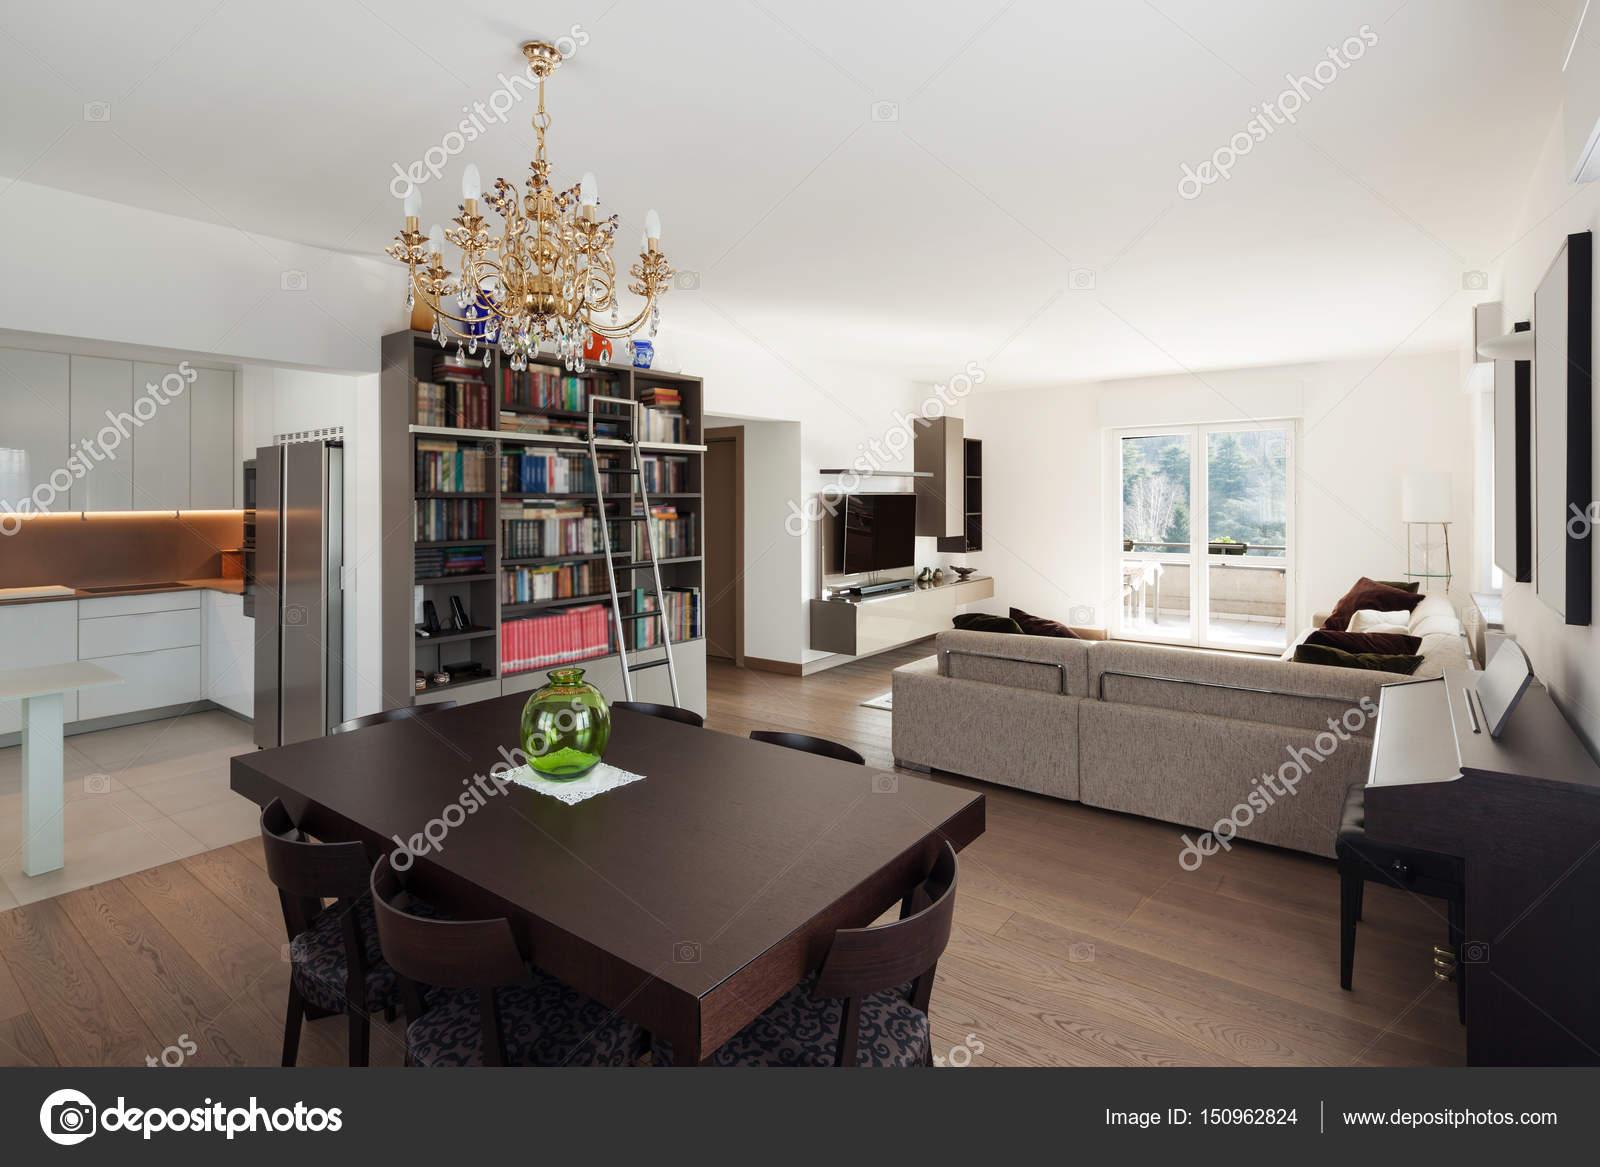 Grote woonkamer met eettafel, interieur — Stockfoto © Zveiger #150962824